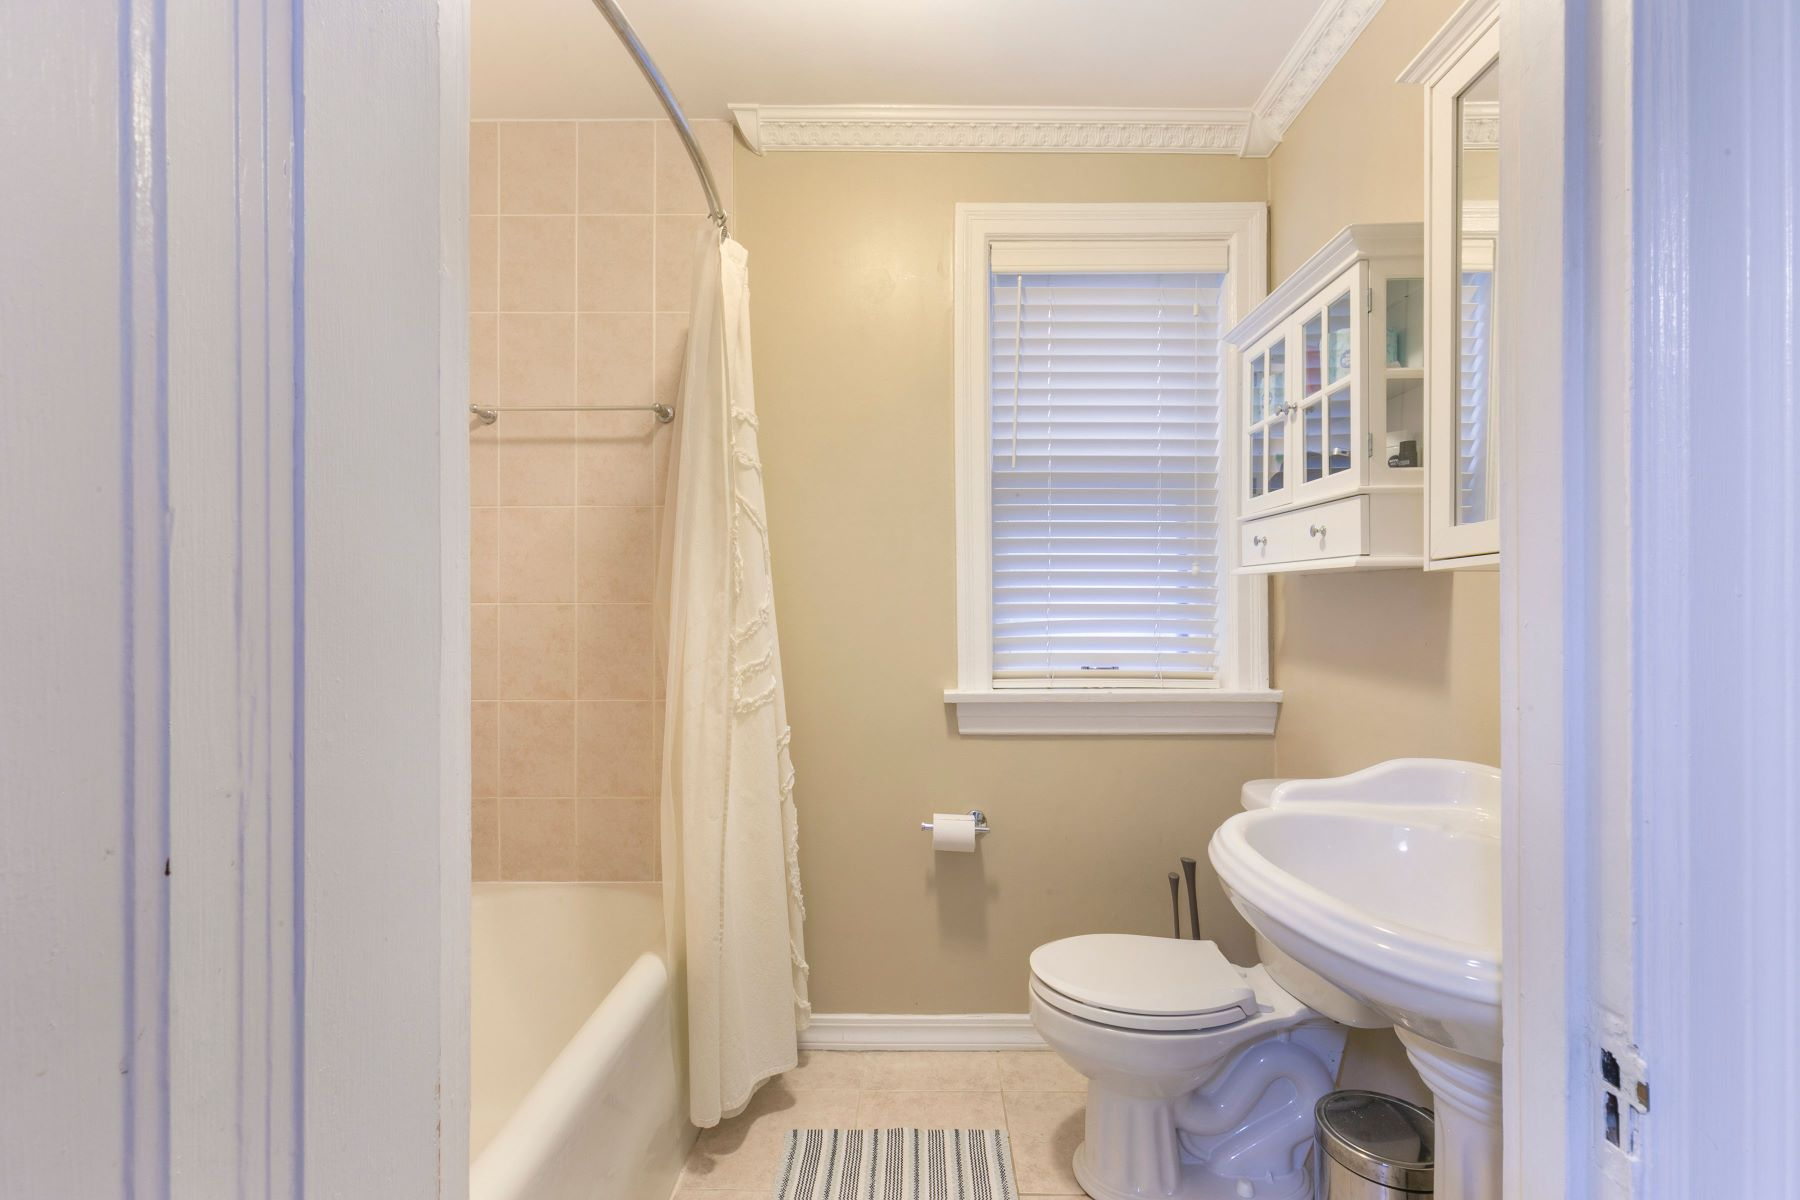 Additional photo for property listing at The Buckingham 7507 Buckingham Dr #1W Clayton, Missouri 63105 United States